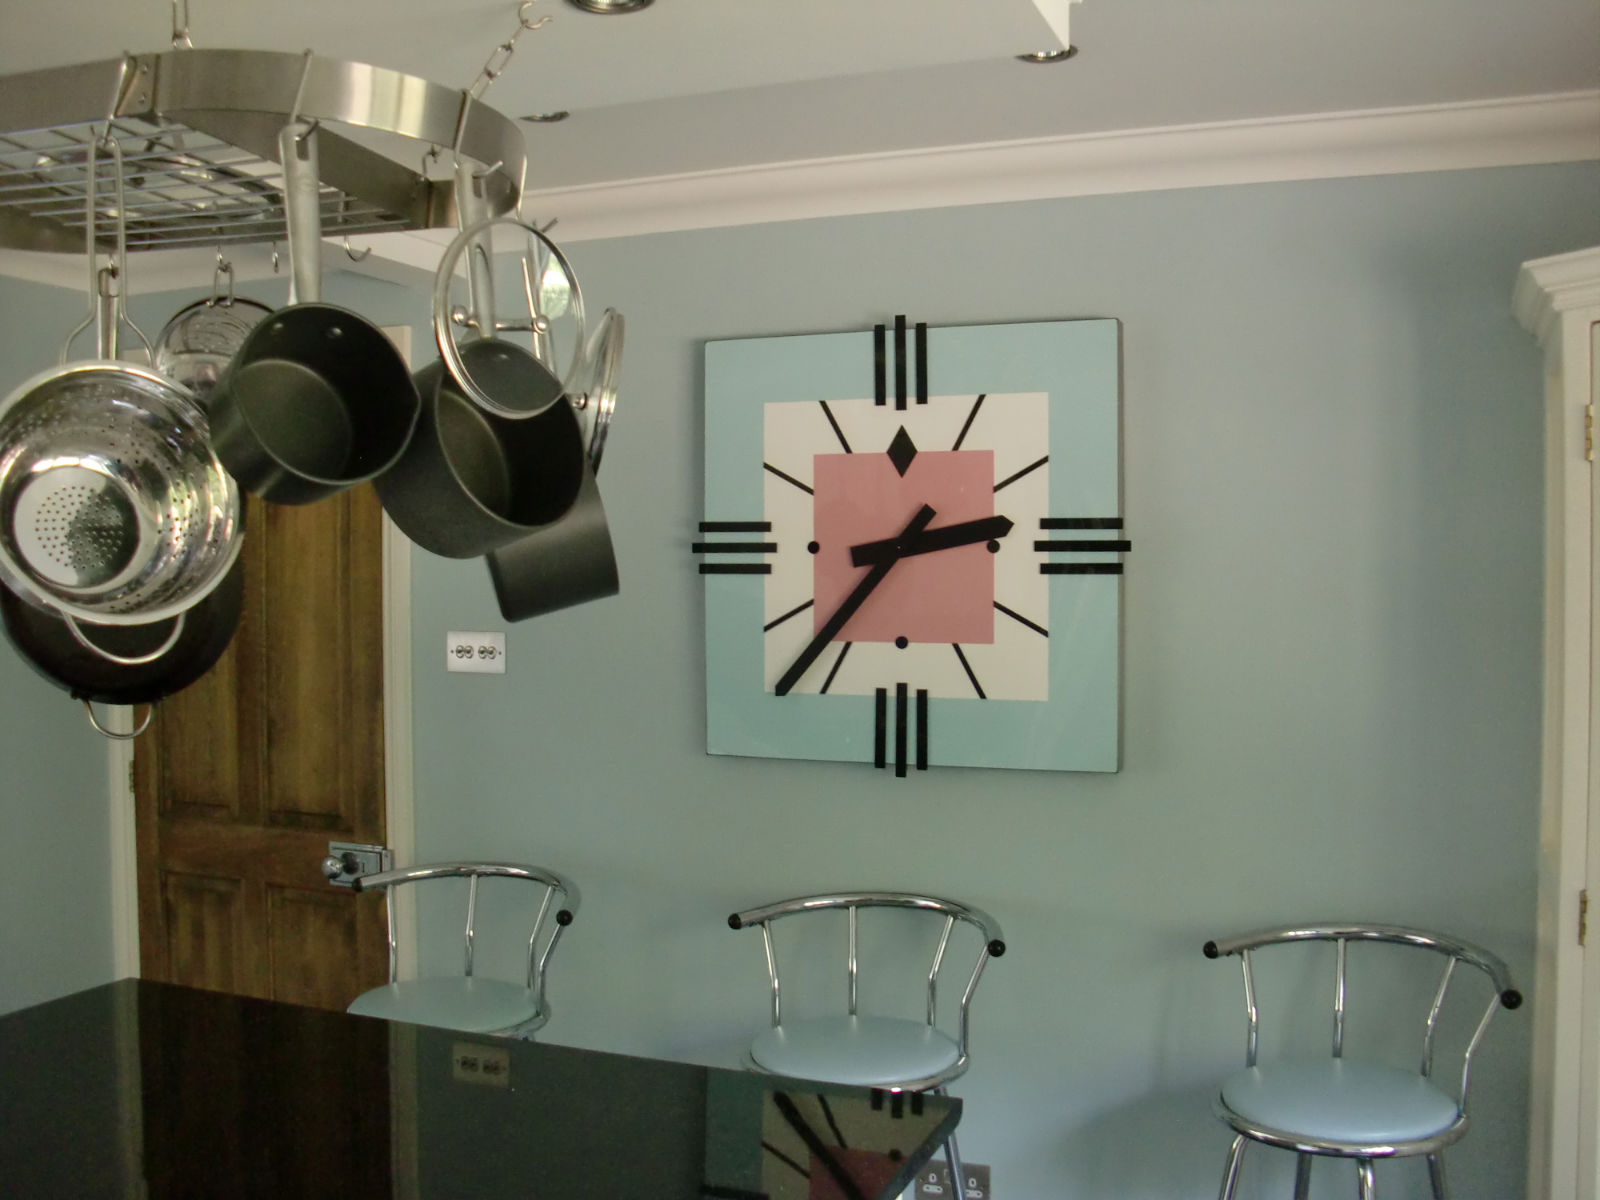 Art Deco inspired kitchen clock